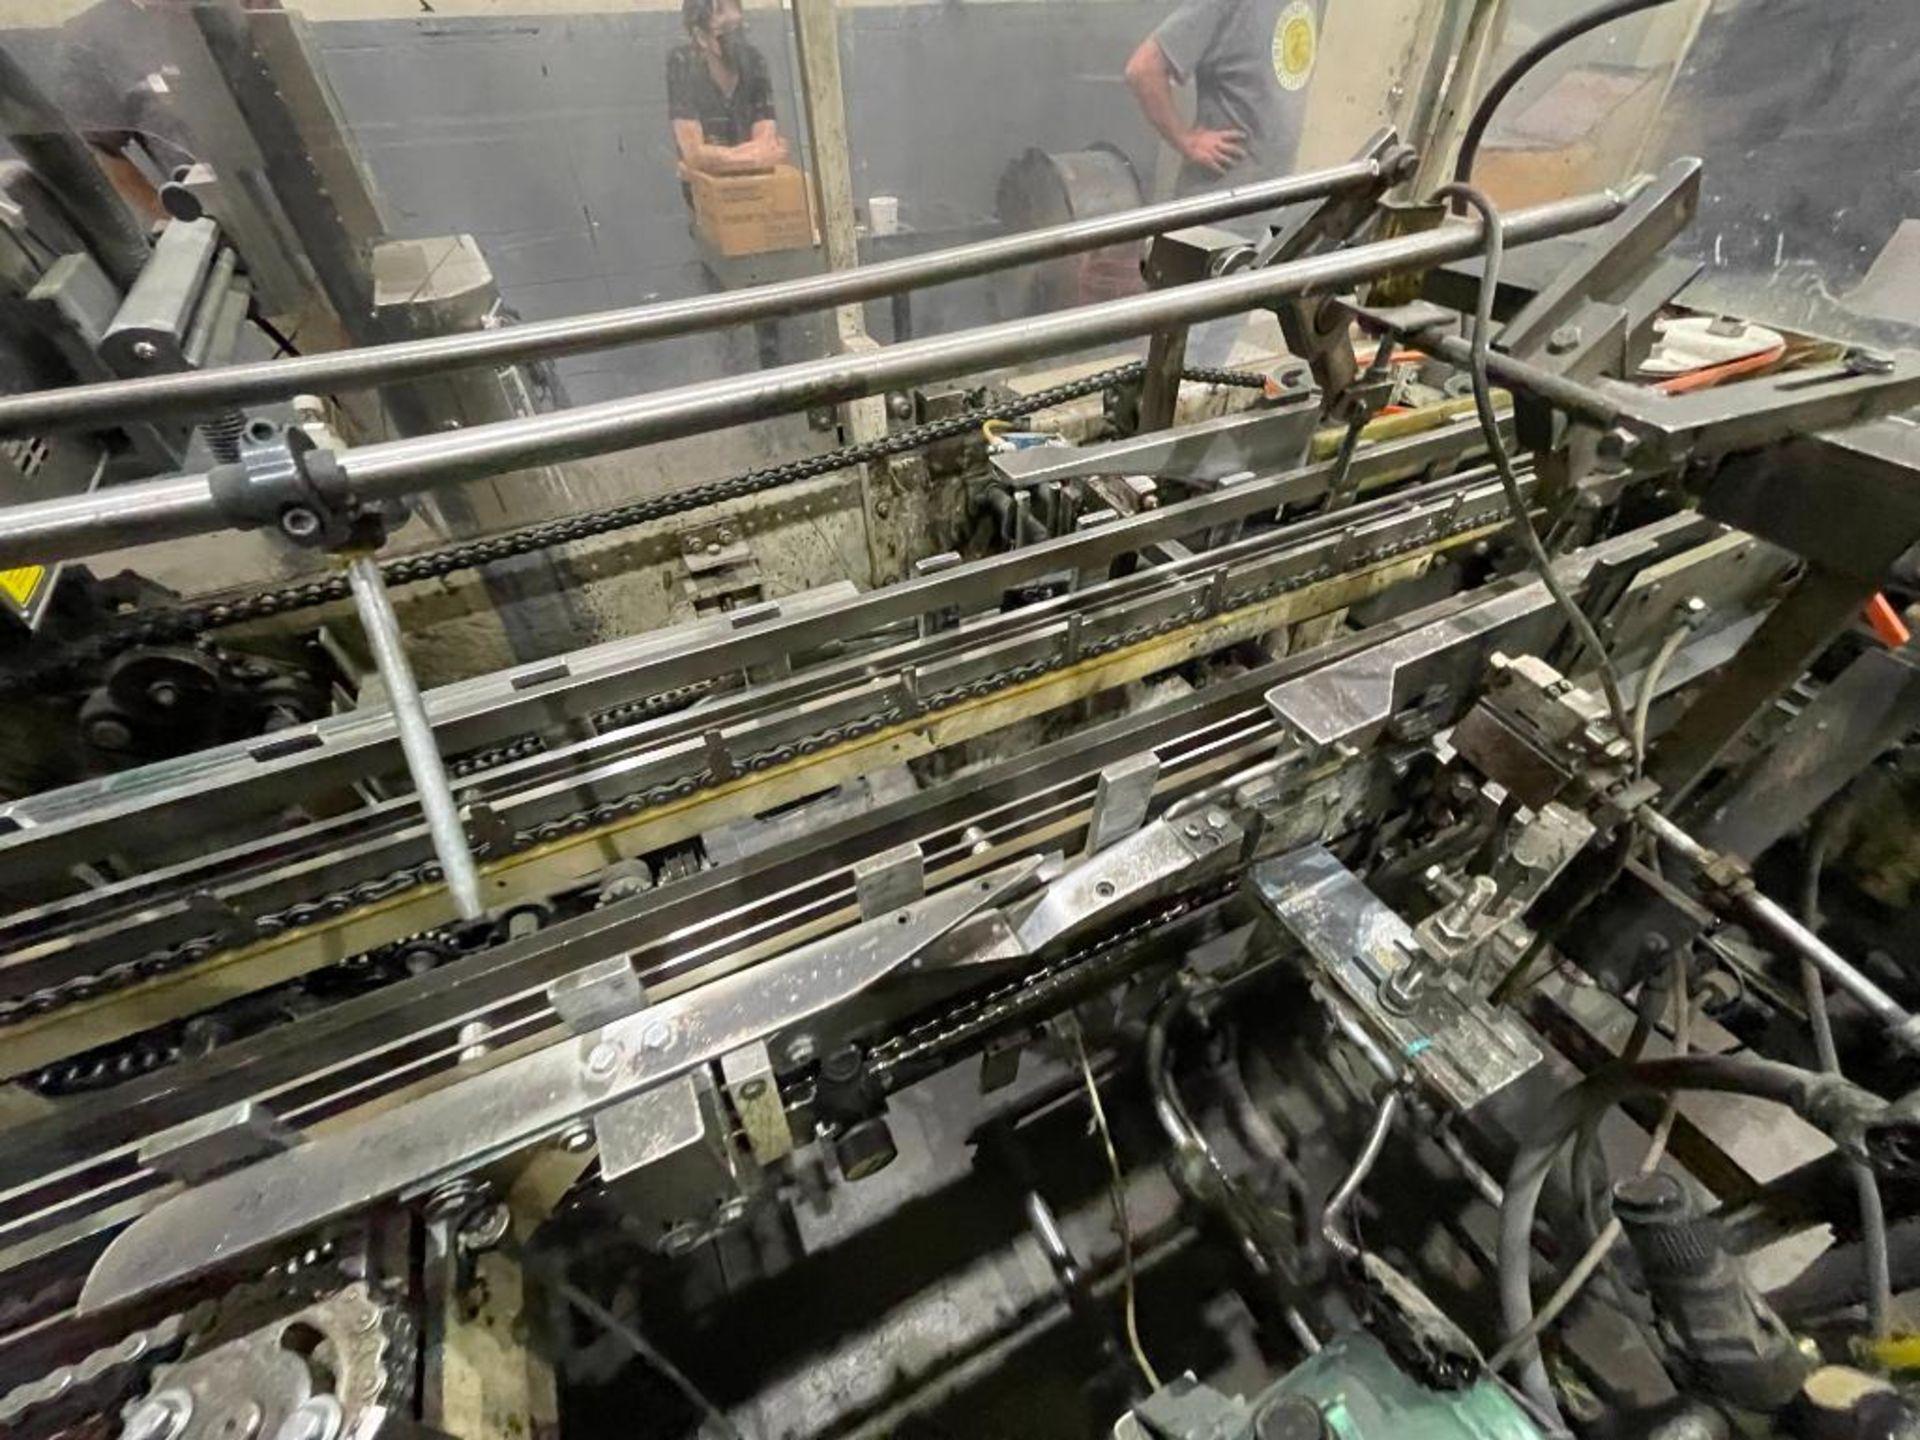 Hayes Machine Co. long goods cartoner, model 51BB - Image 54 of 64